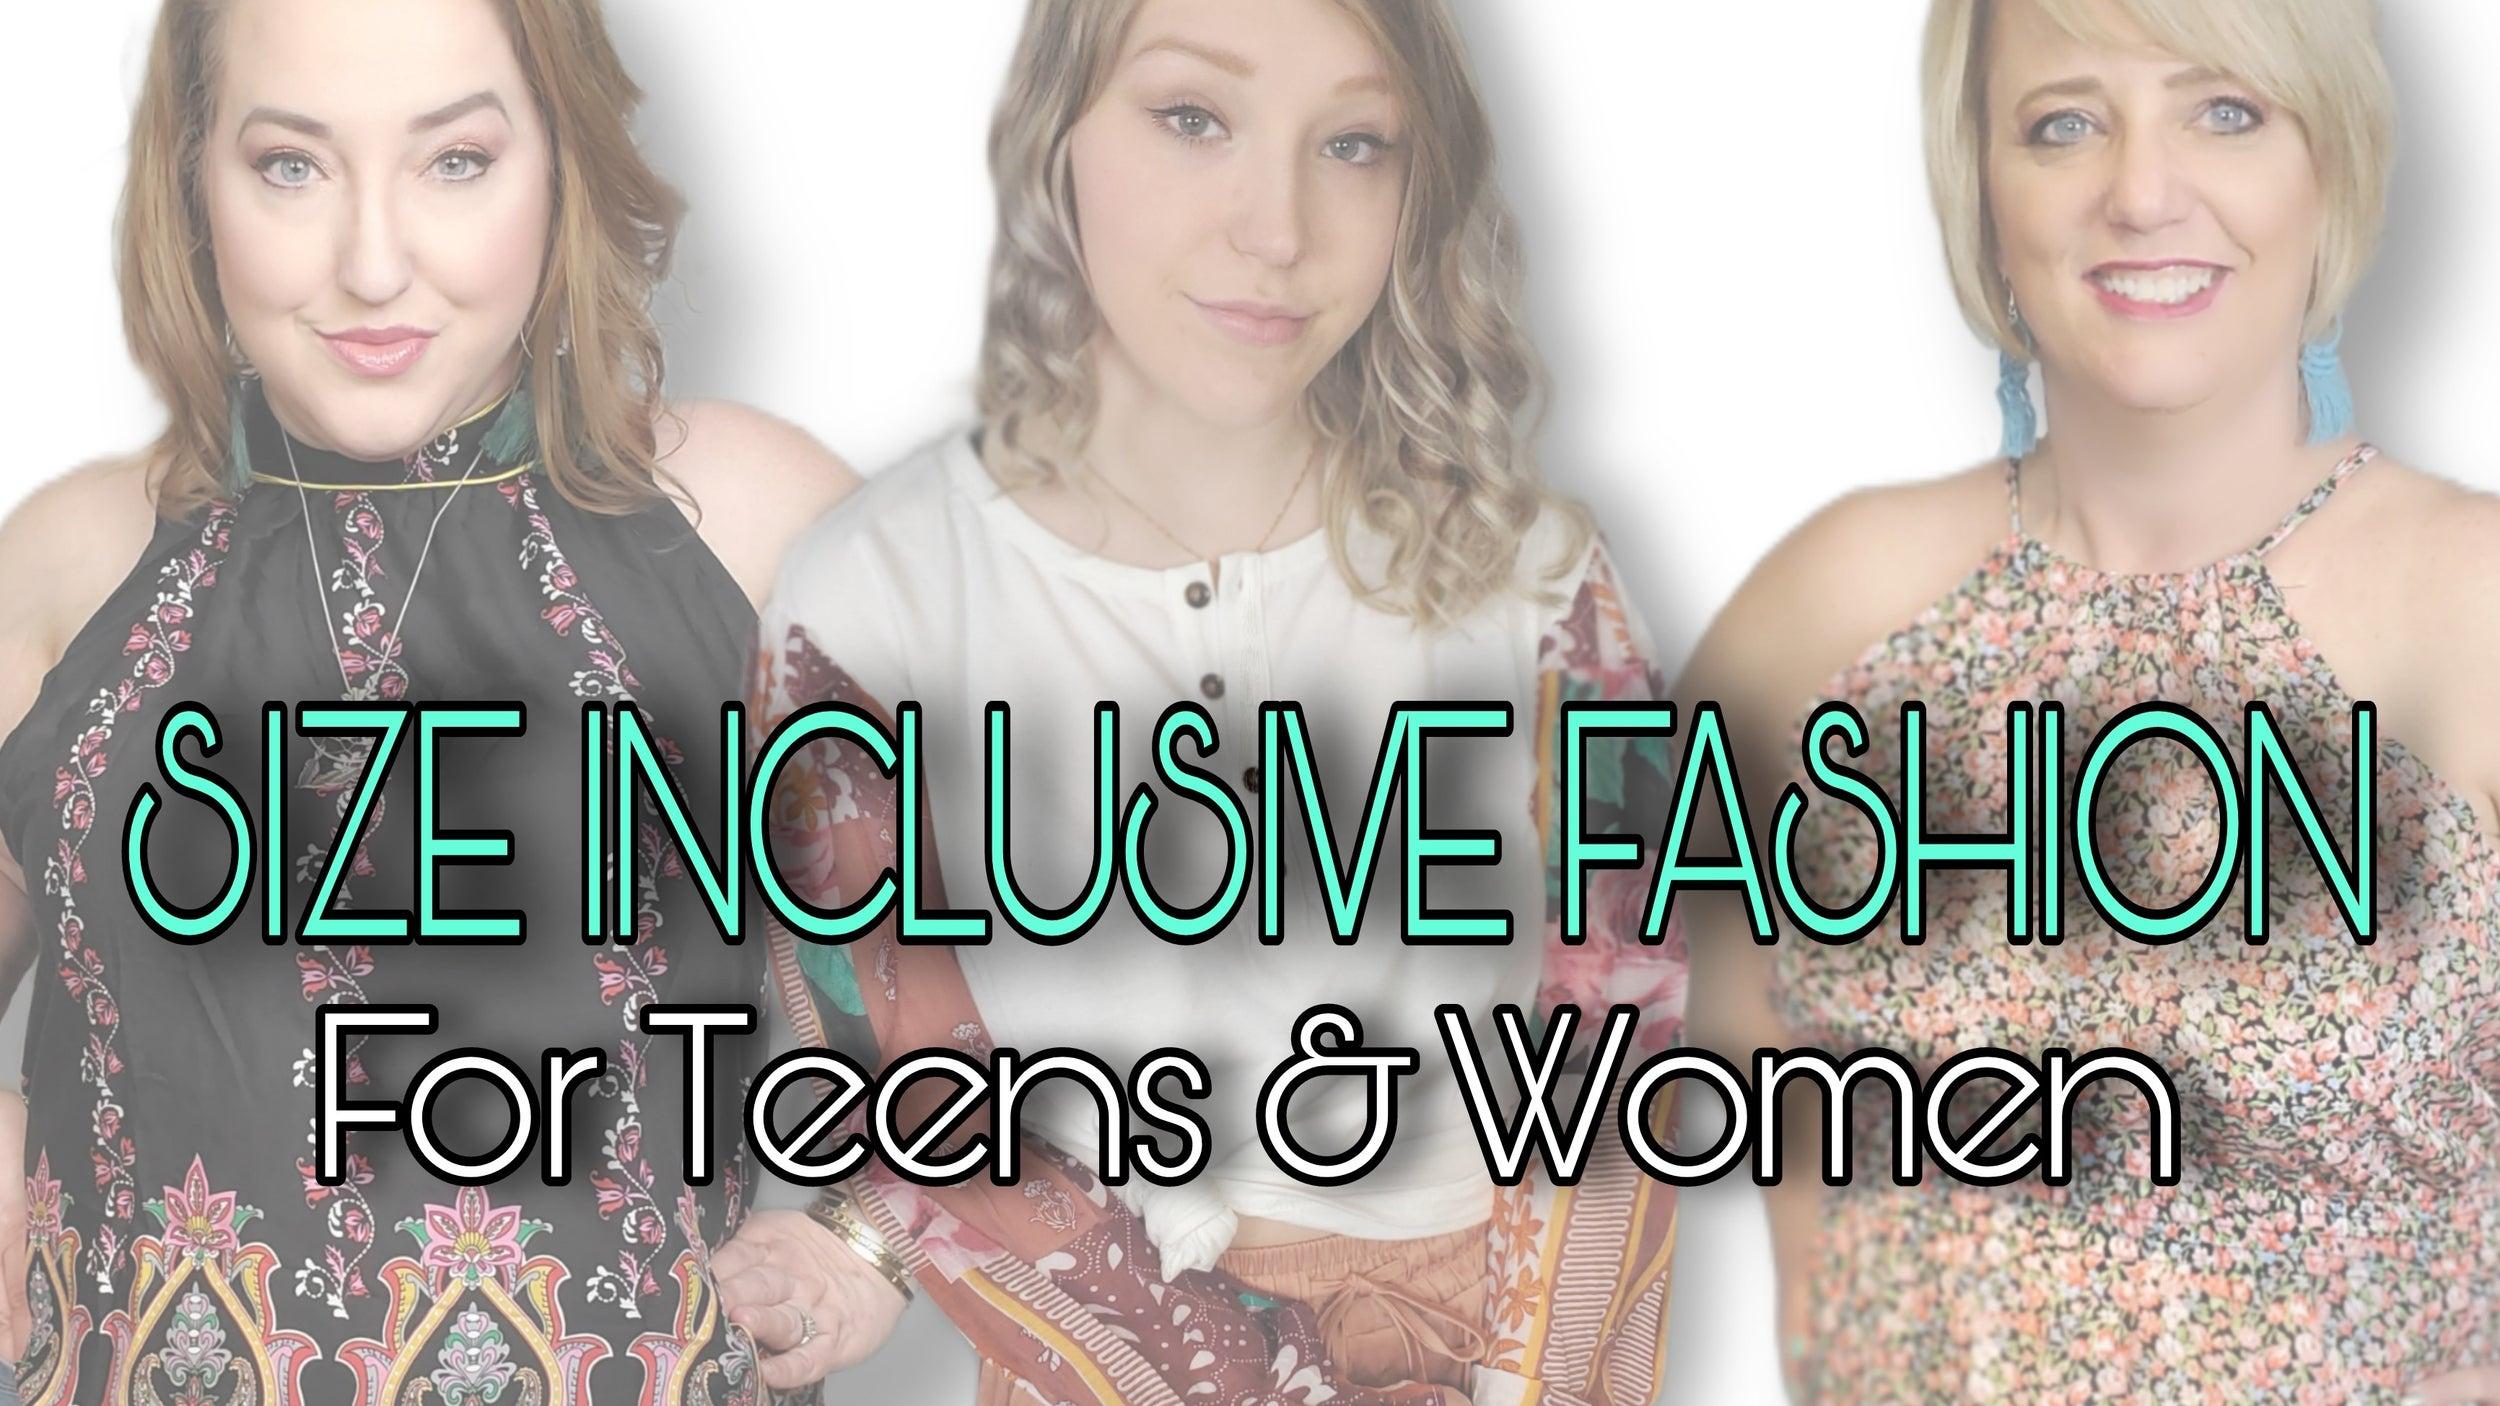 Fashion For teens & women